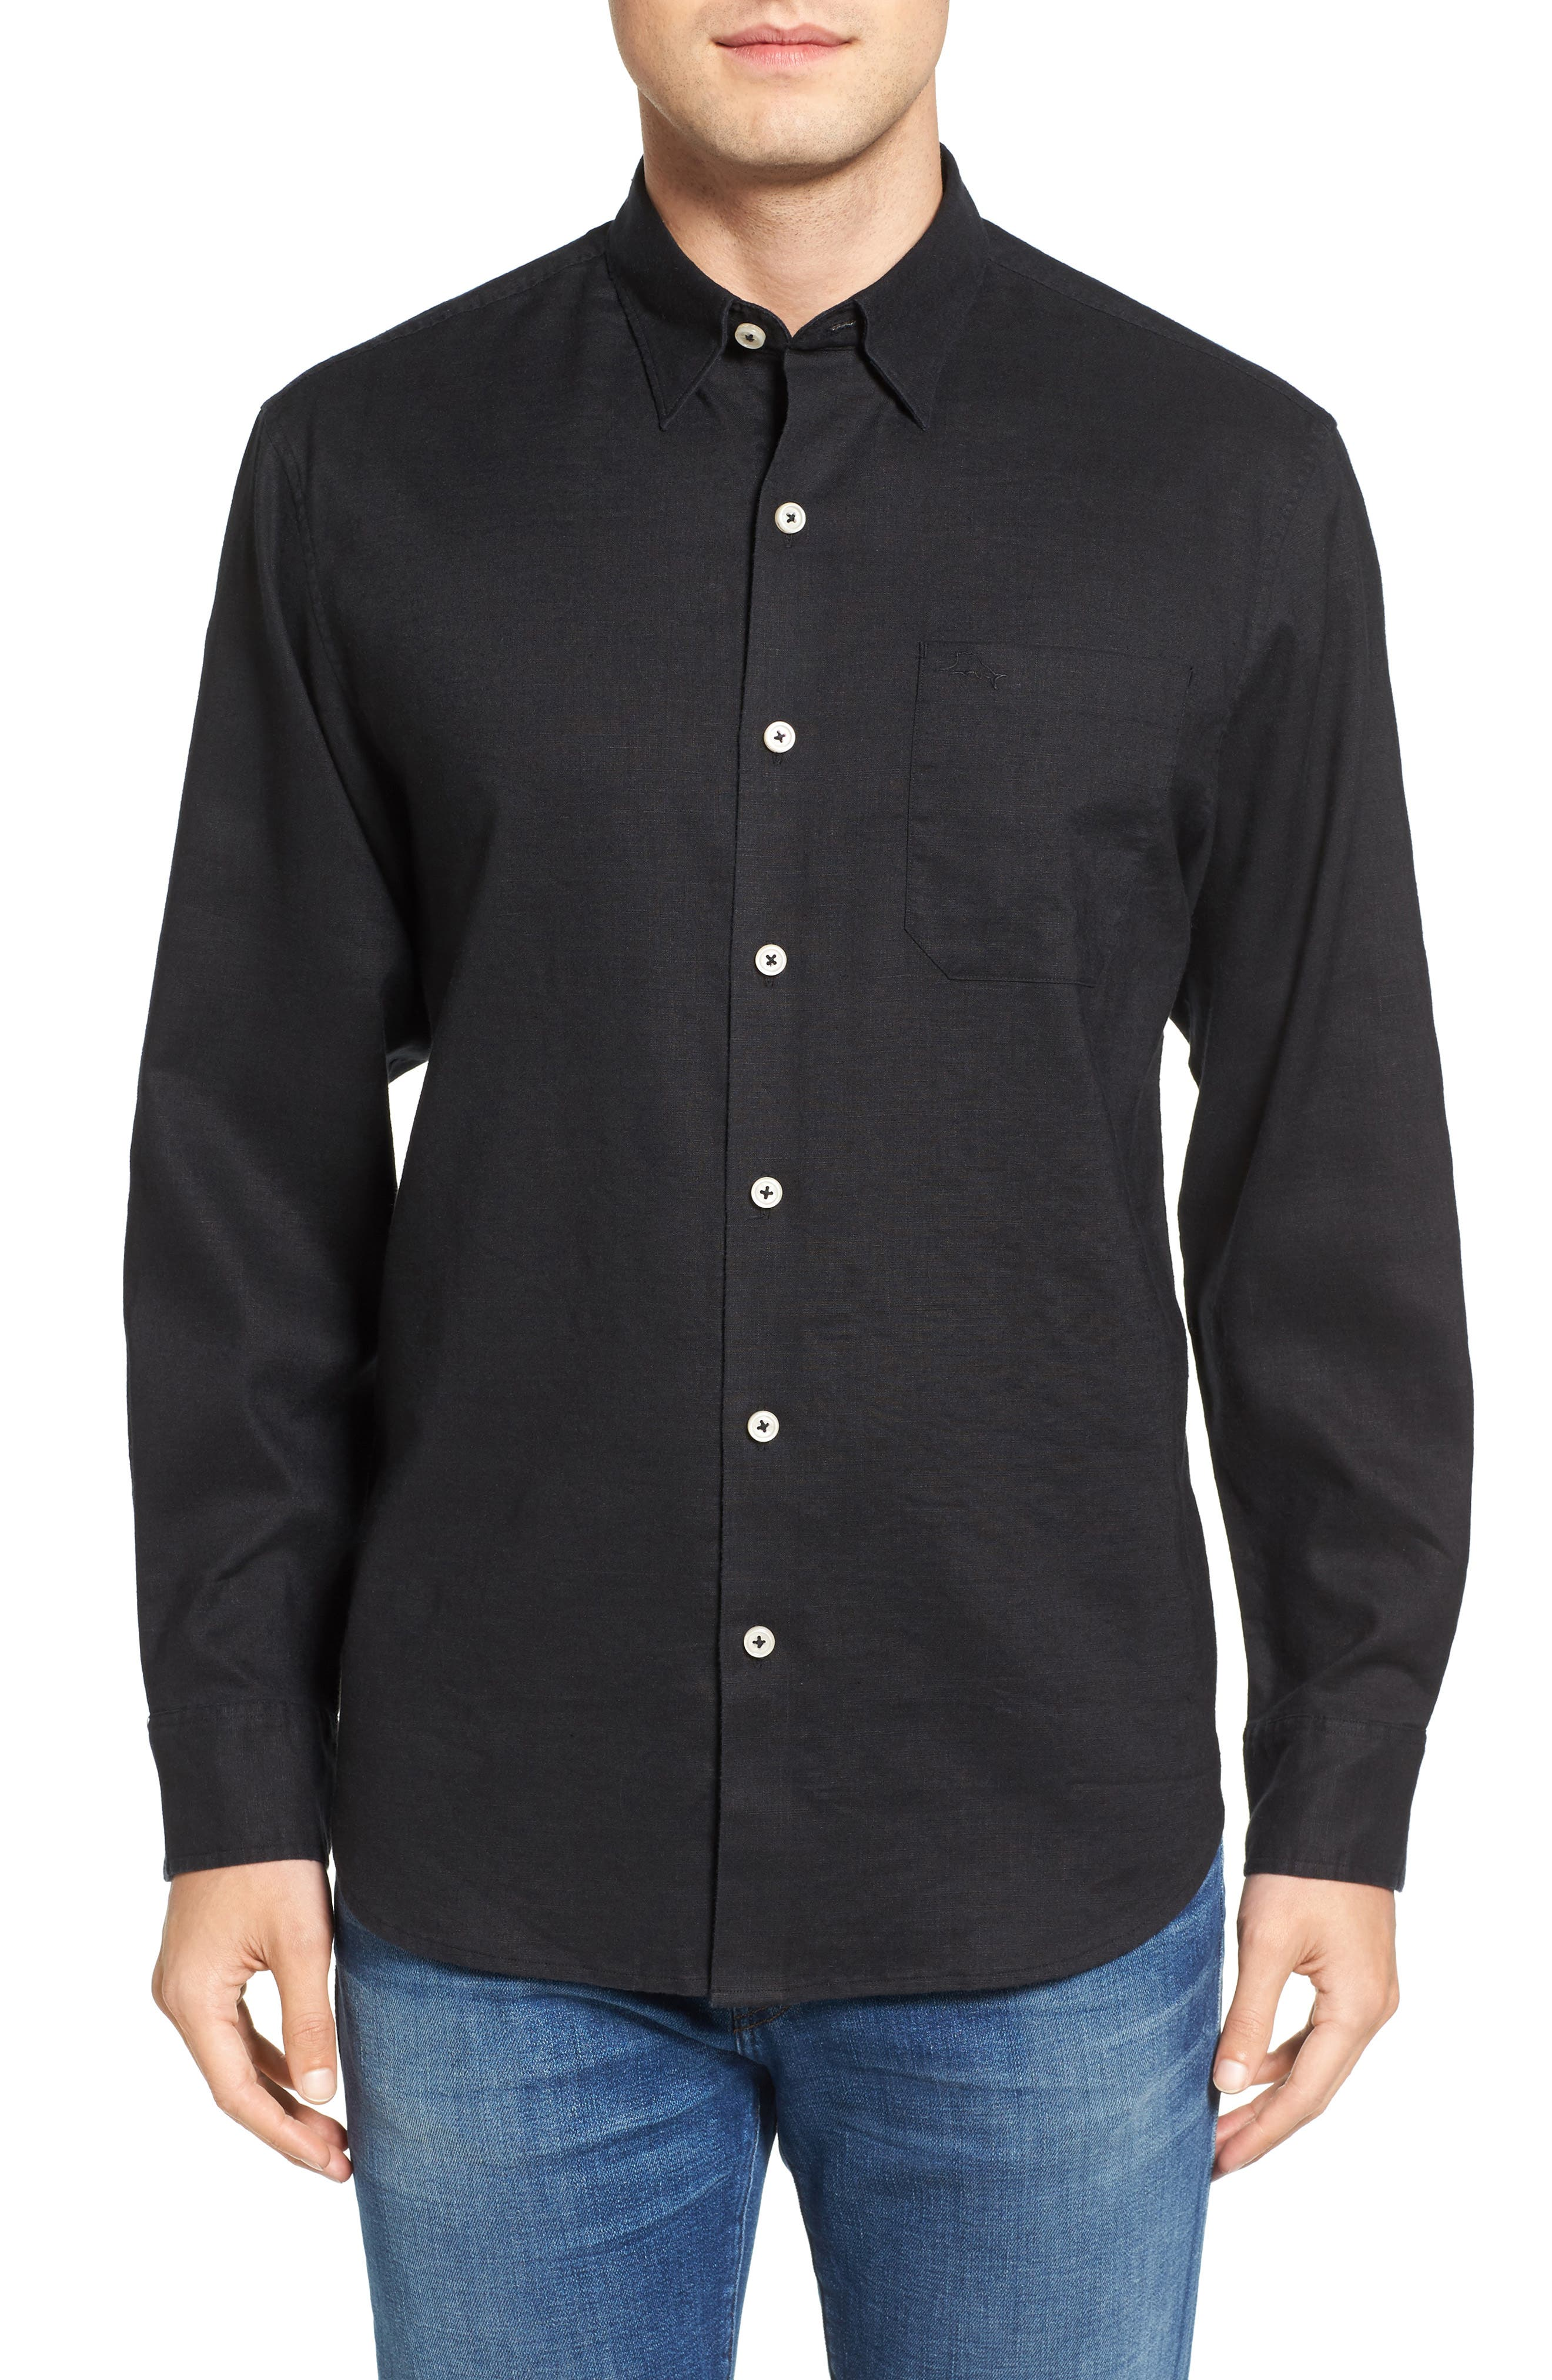 Tommy Bahama Monaco Tides Linen Blend Sport Shirt (Big & Tall)